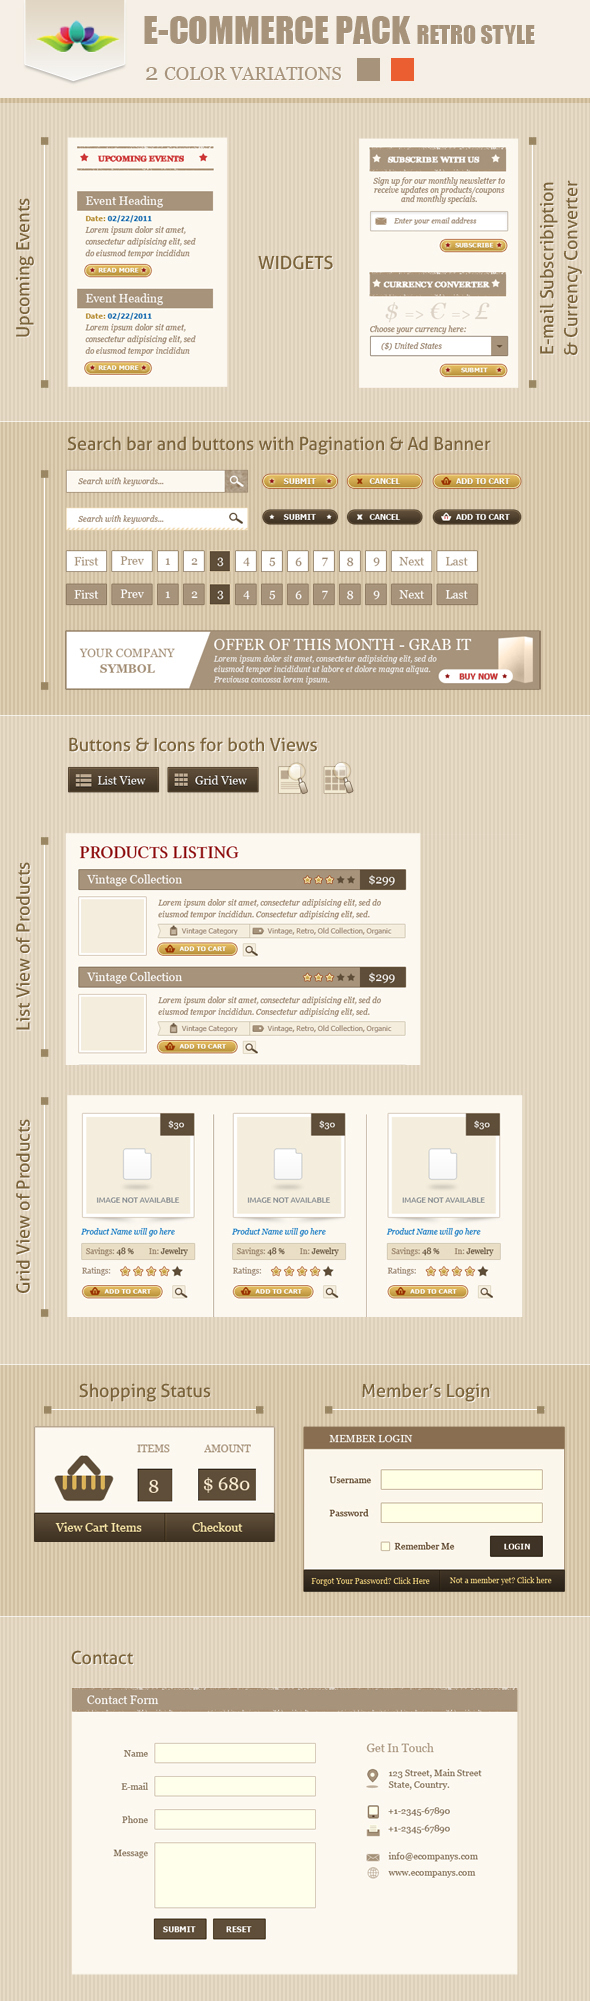 E-Commerce Pack Retro Style by Saptarang